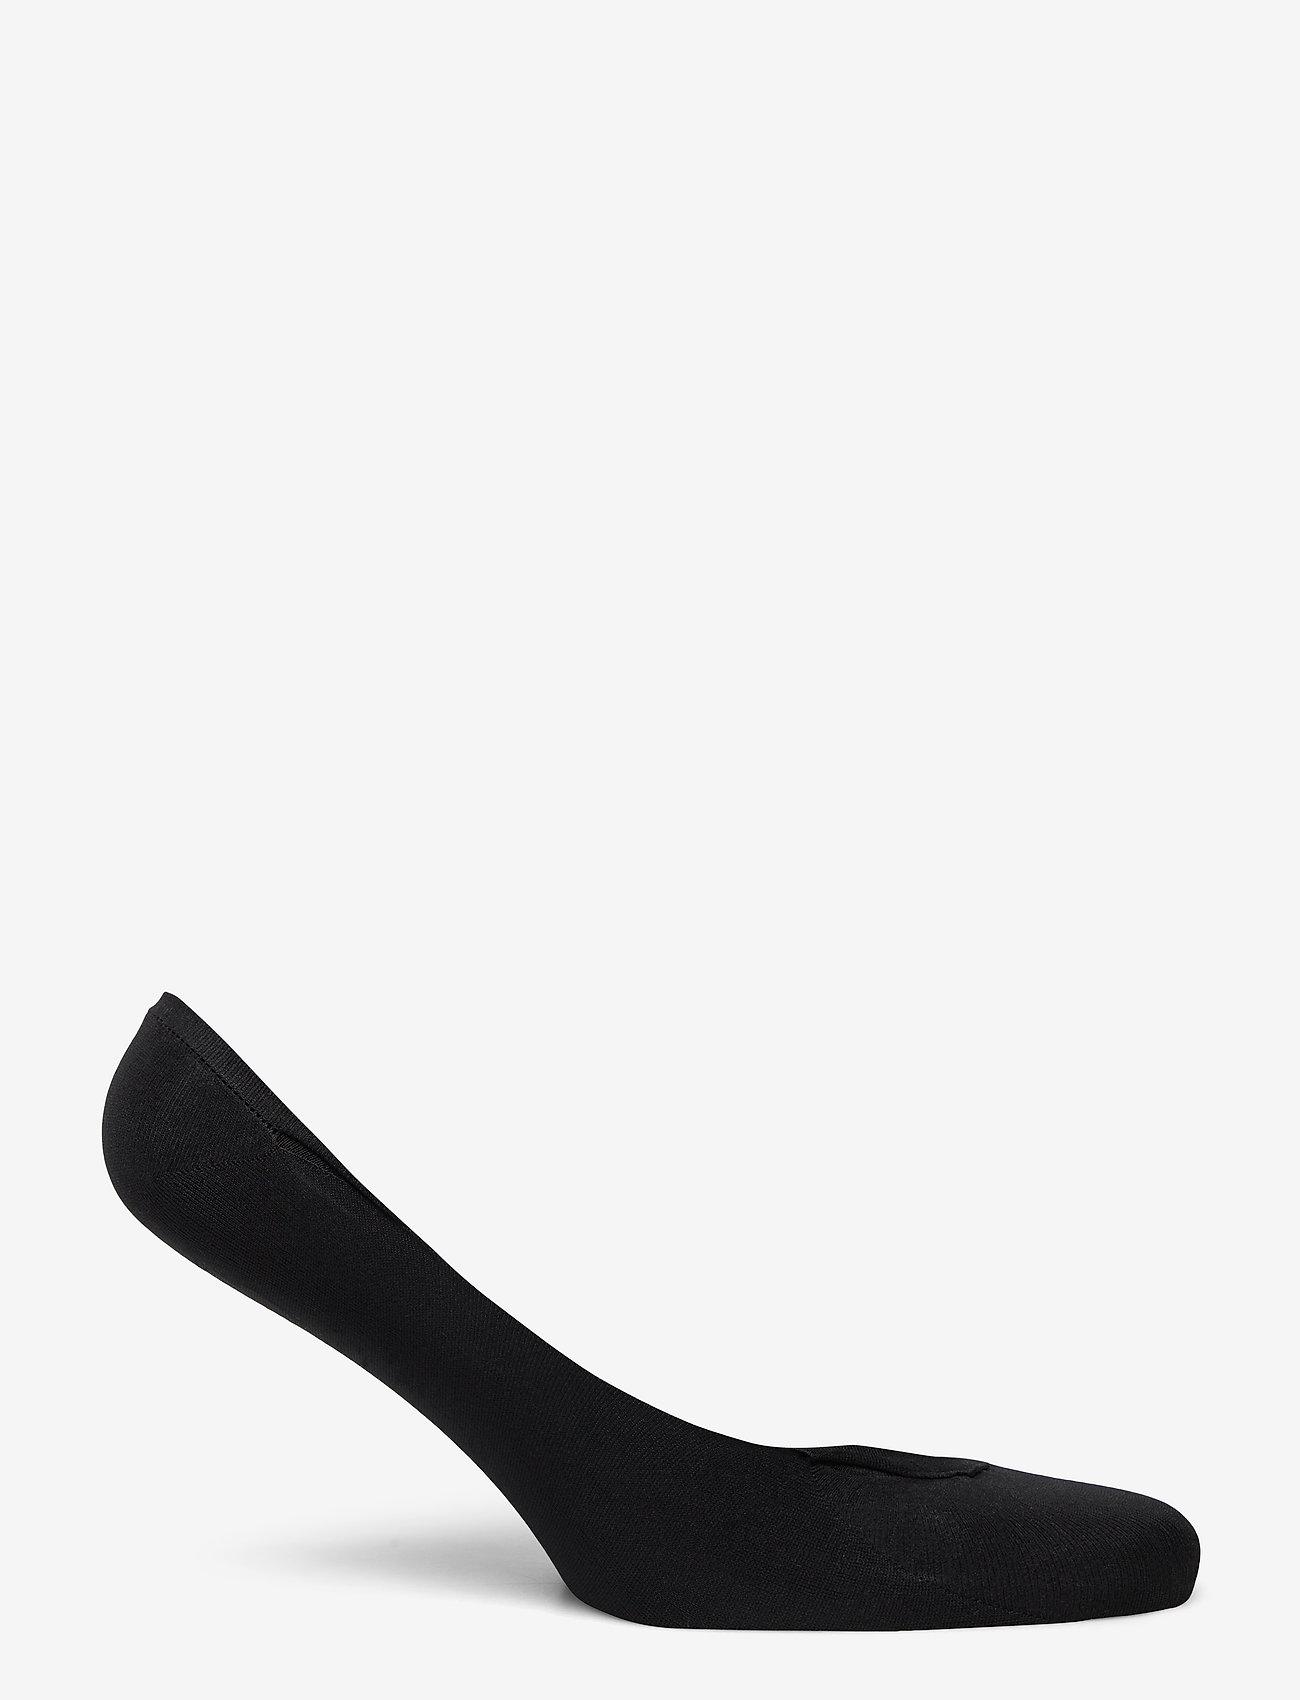 Vogue - Ladies steps den, Conscious Steps, 2 pairs - sneakersokken - black - 1